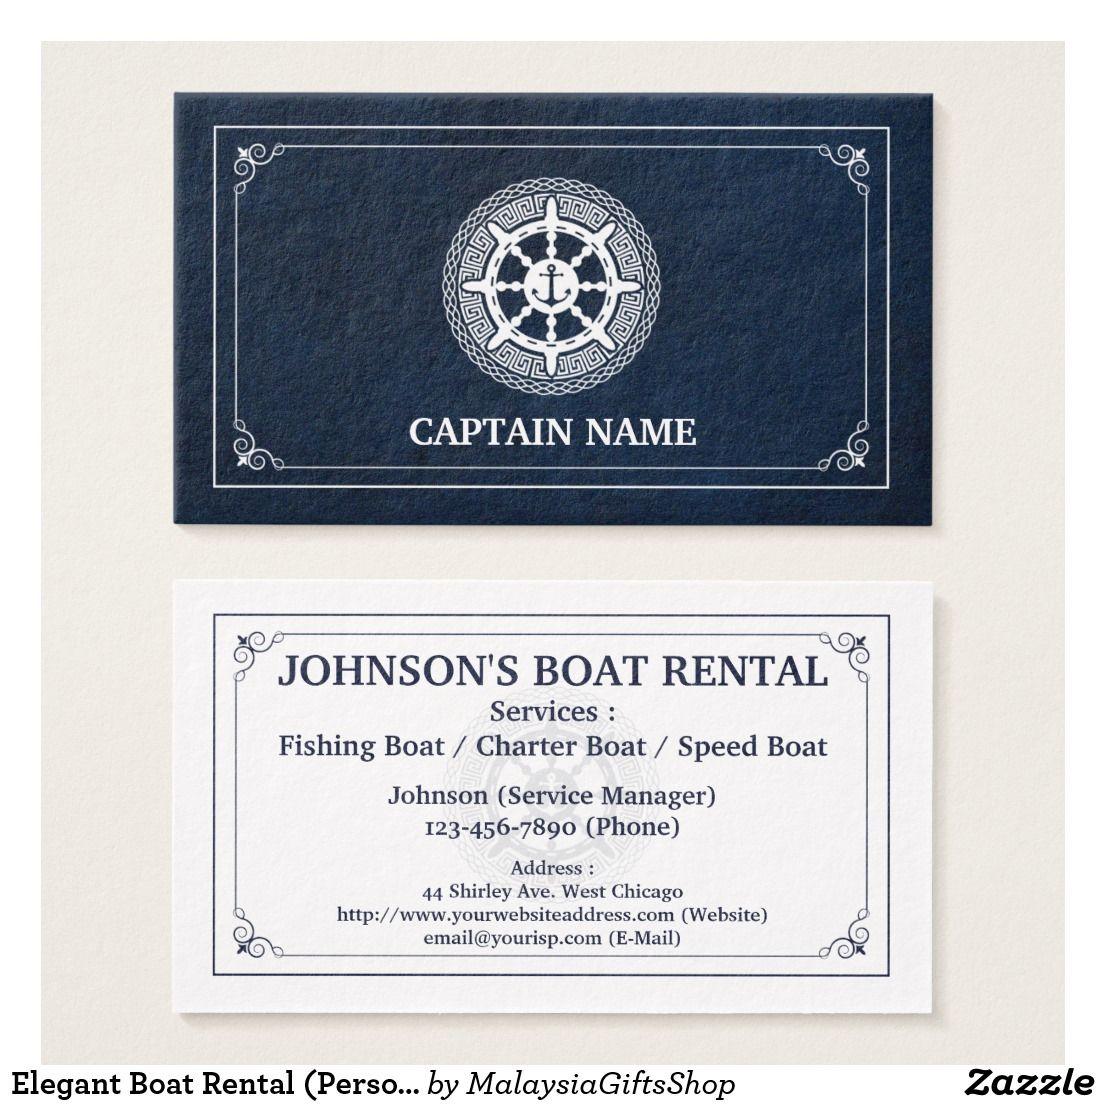 Elegant Boat Rental Personalize Business Card